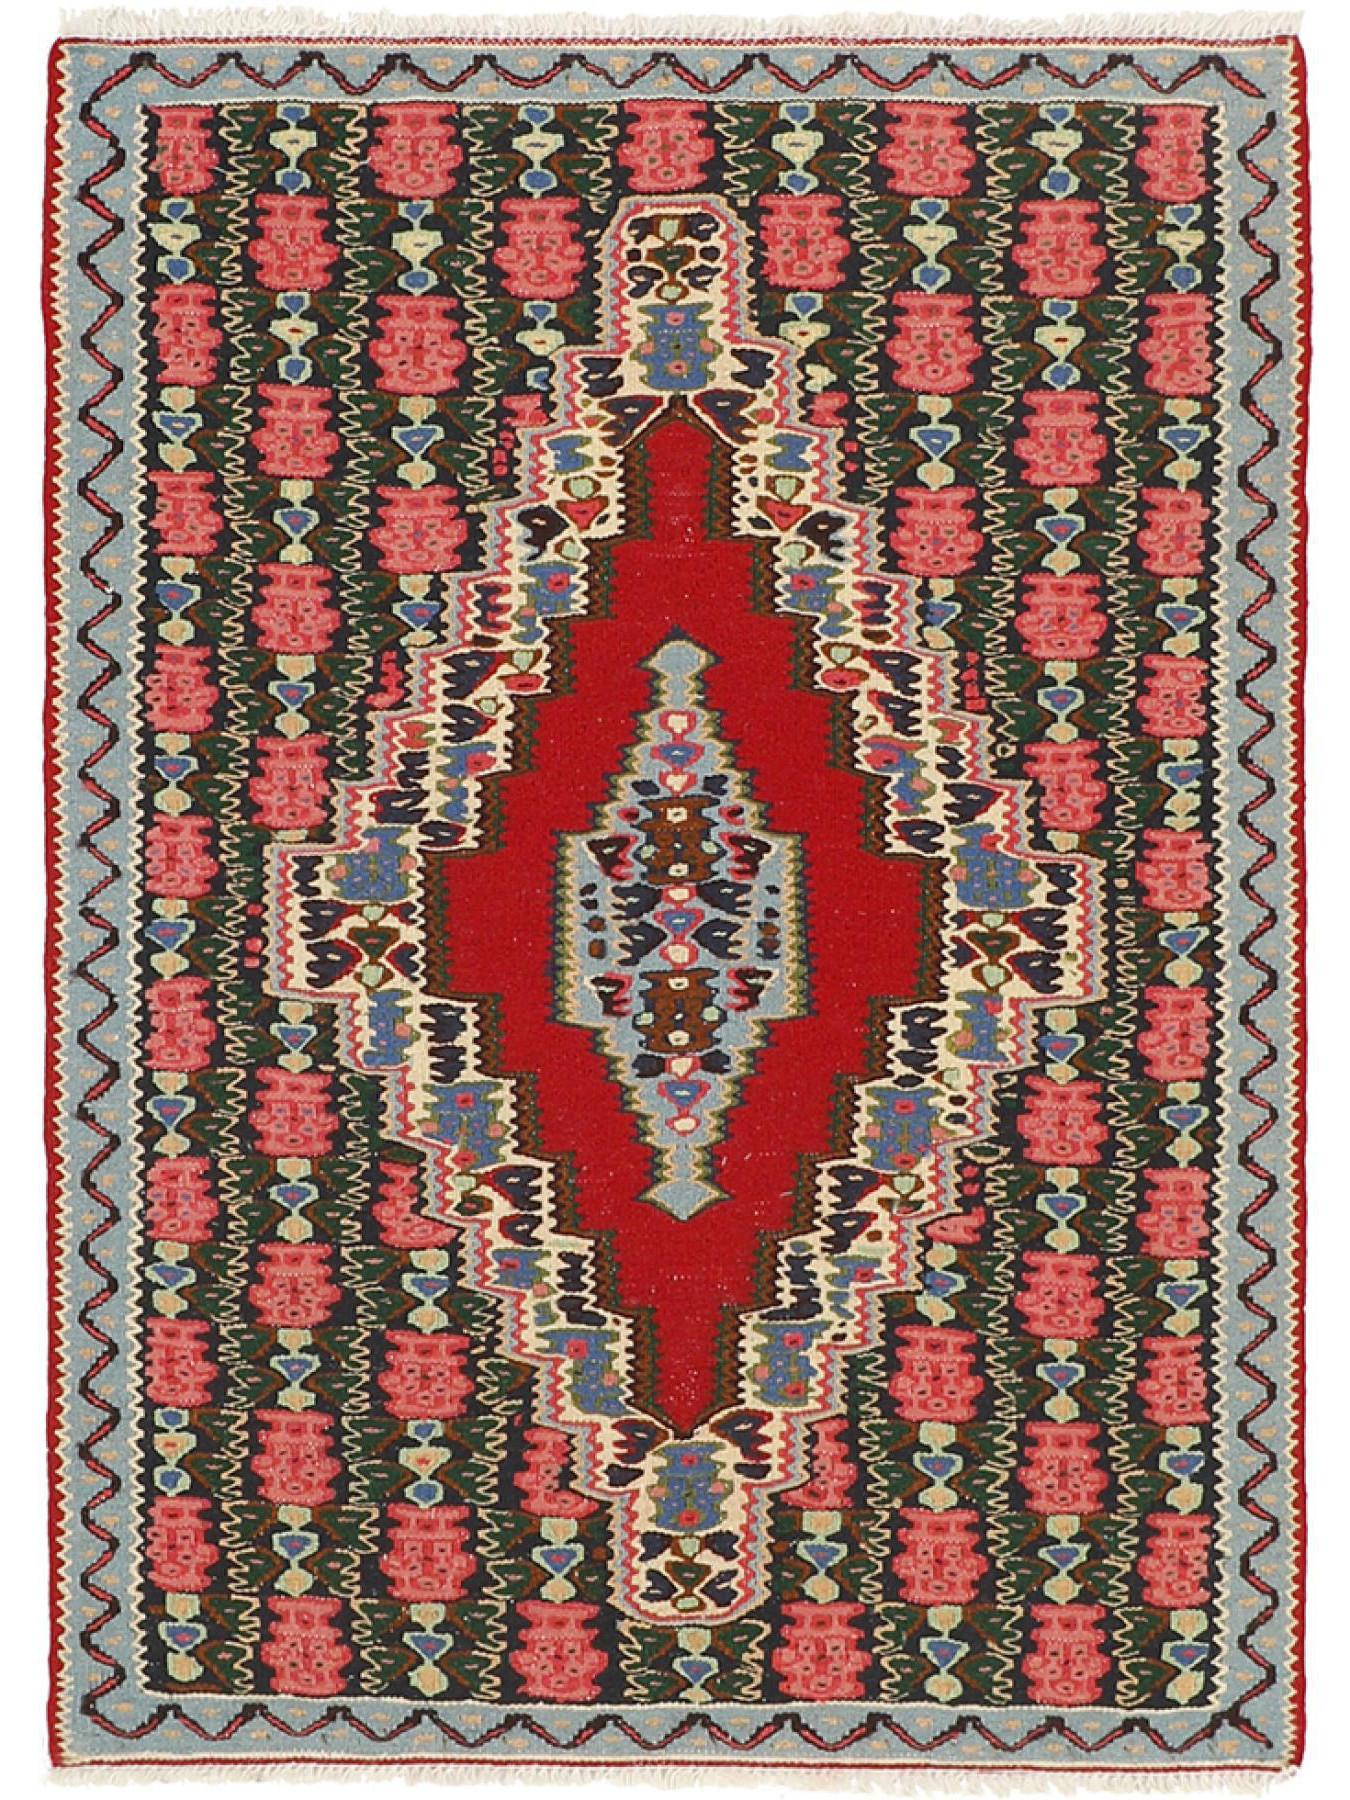 Kilims traditionnels - Kilim Senneh